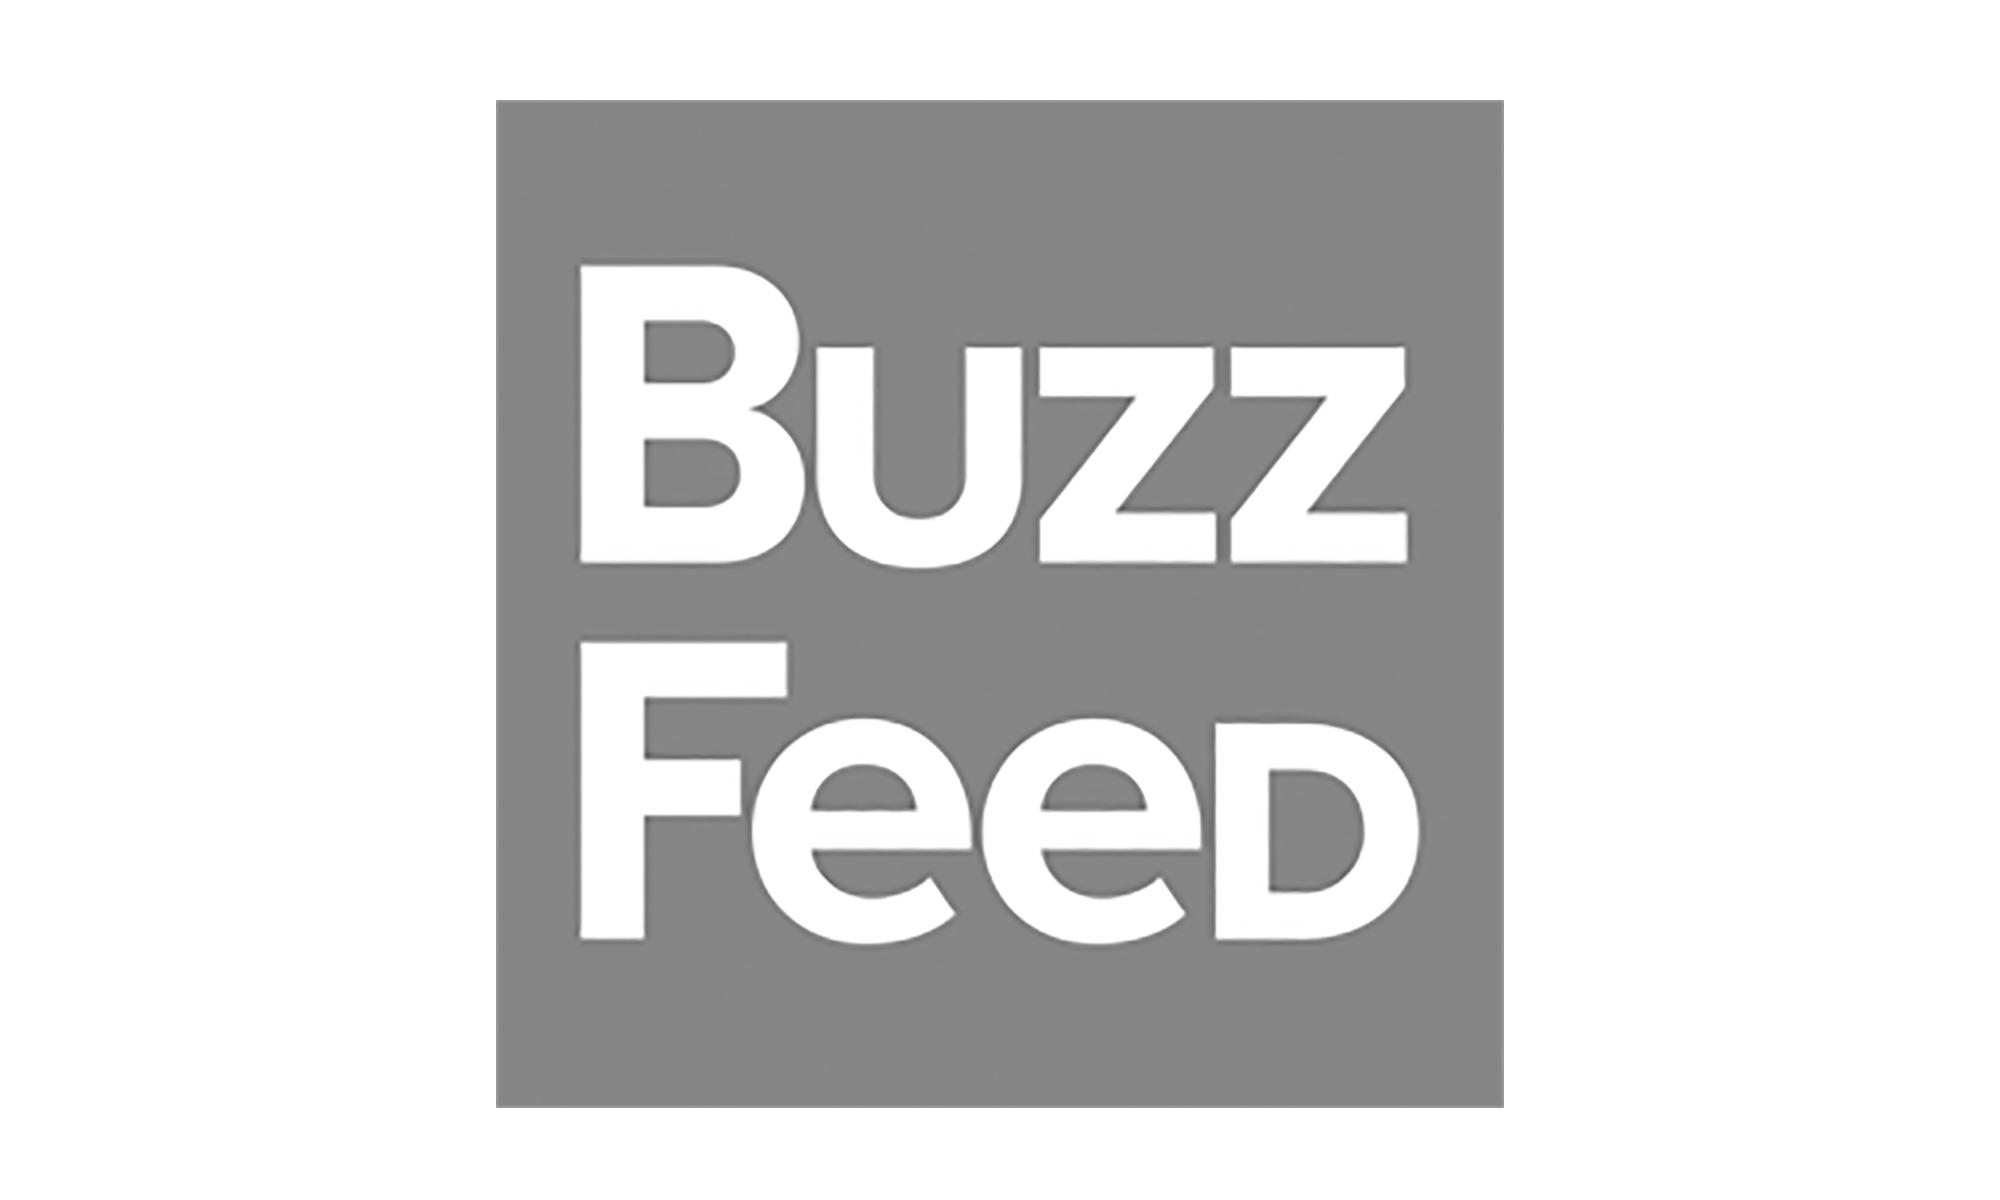 buzz-feed-logo.jpg